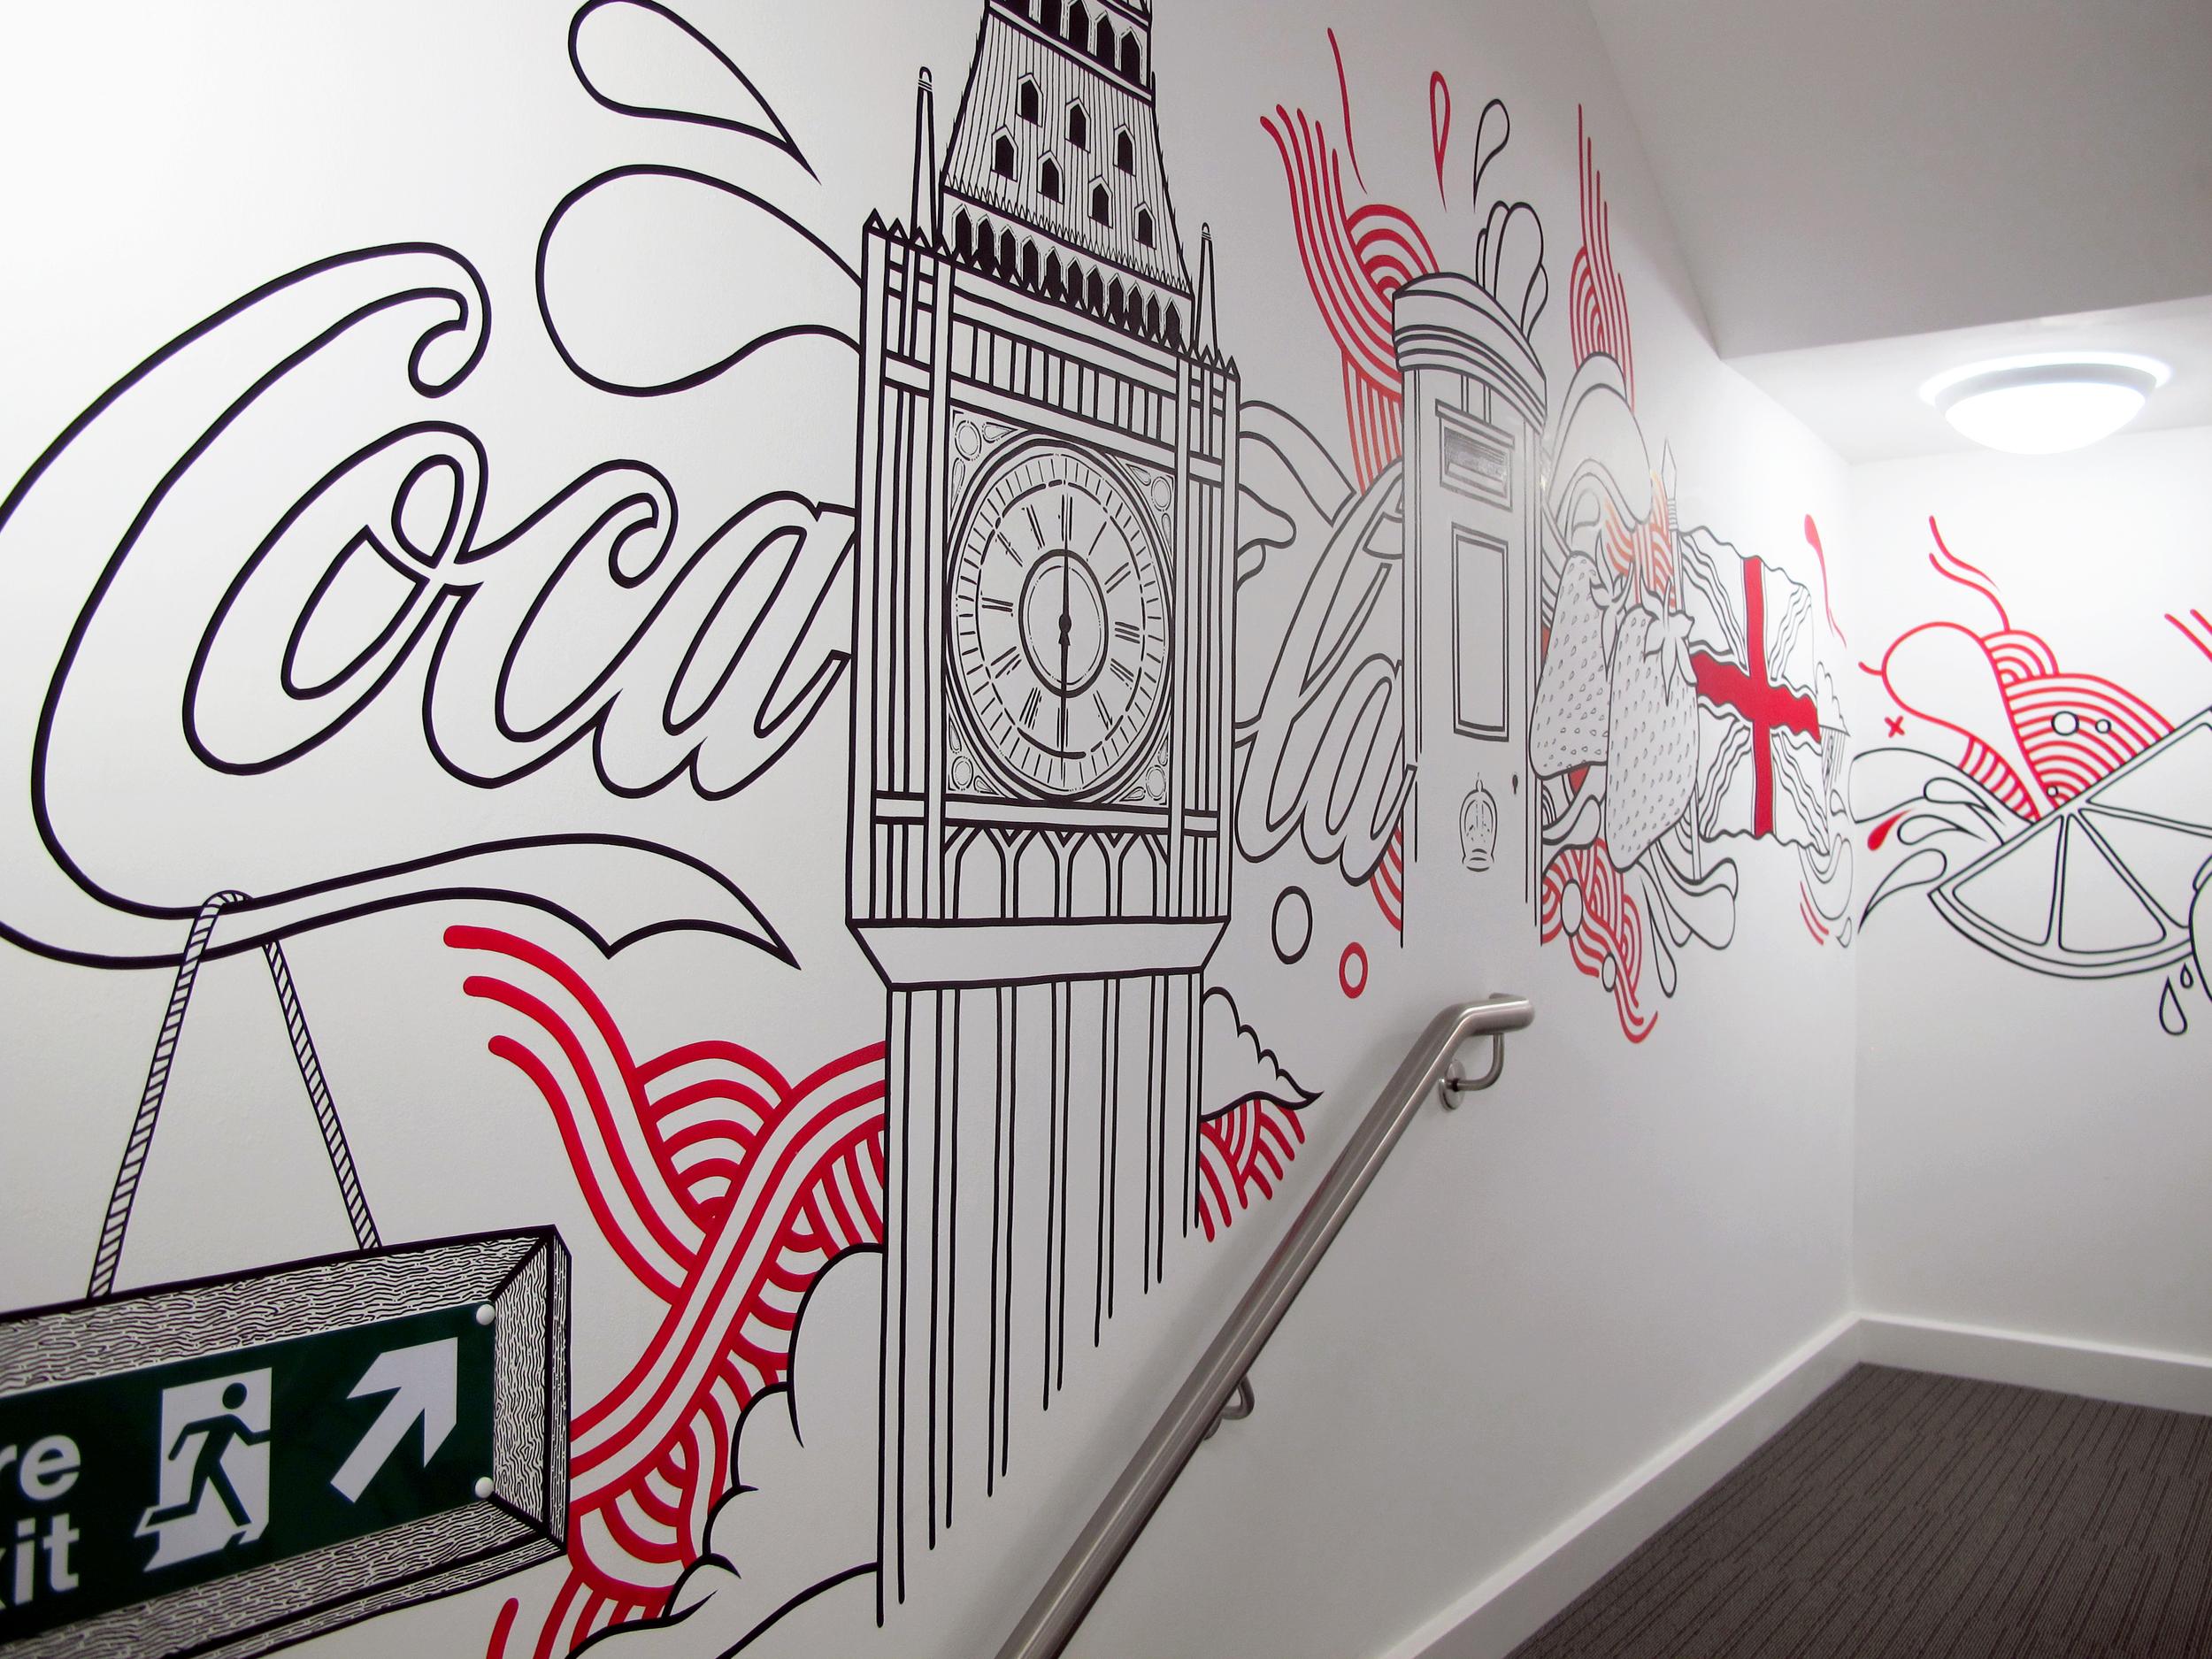 BigBen-Coca-Cola-Lukeembden.jpg